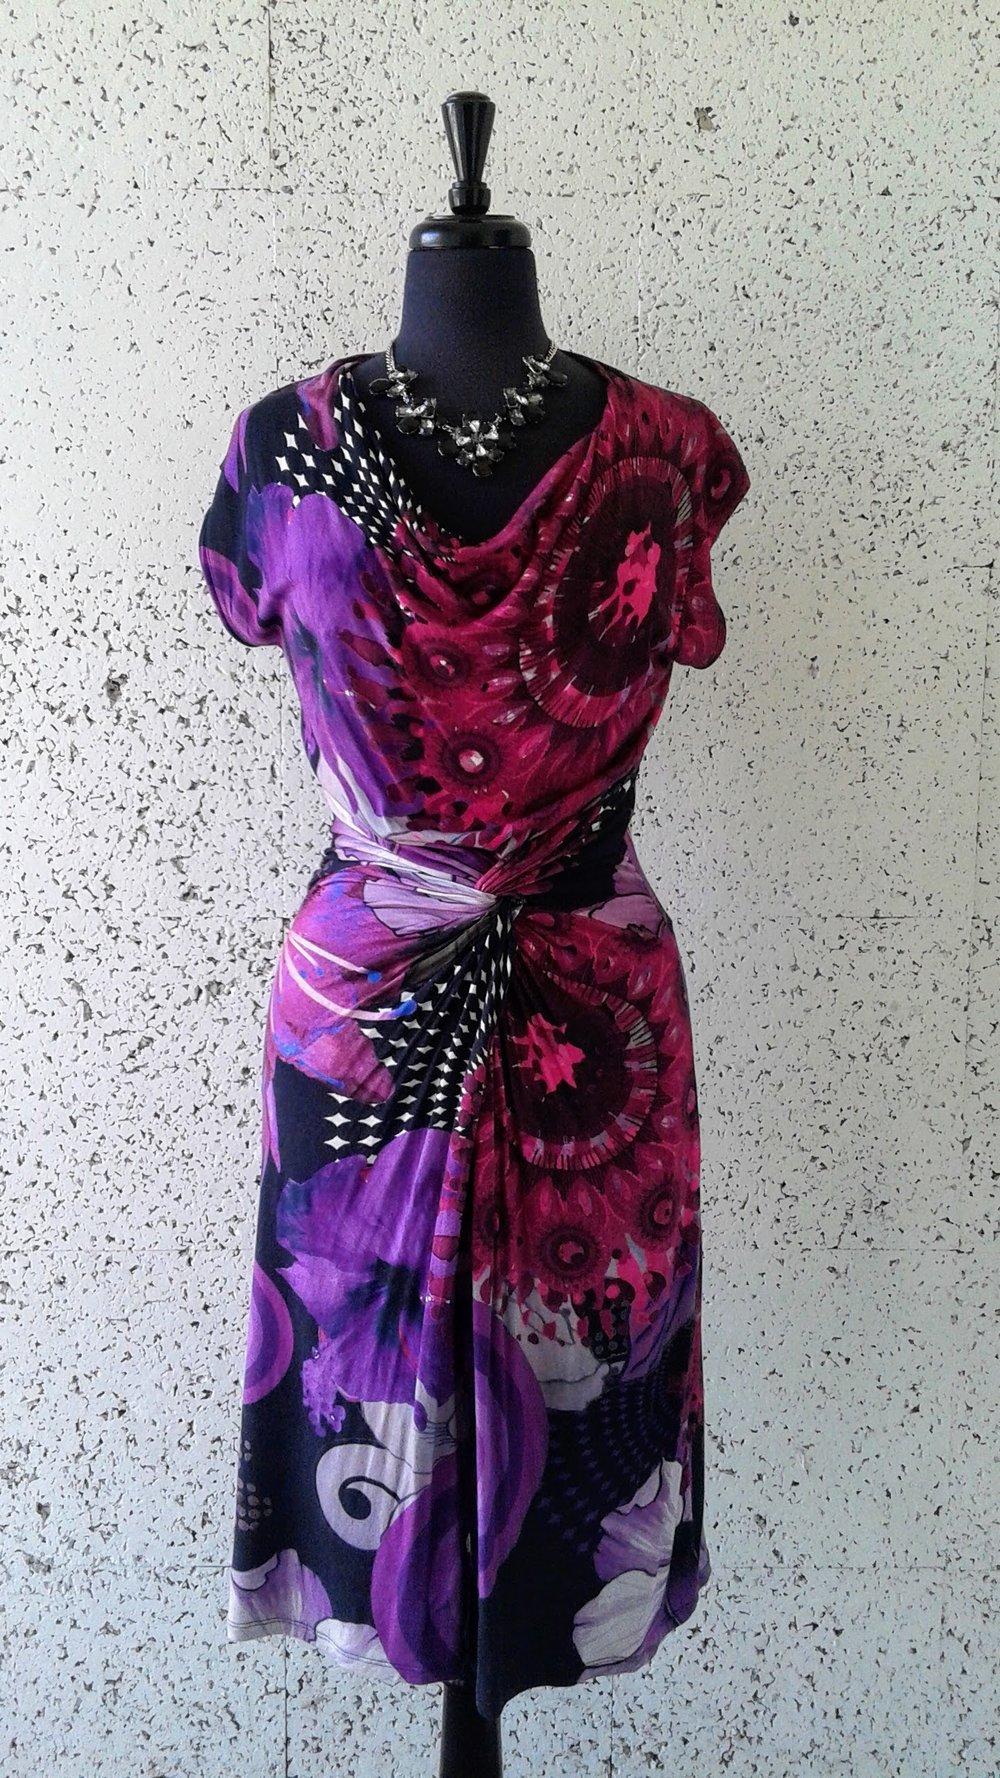 Desigual dress; Size S, $36